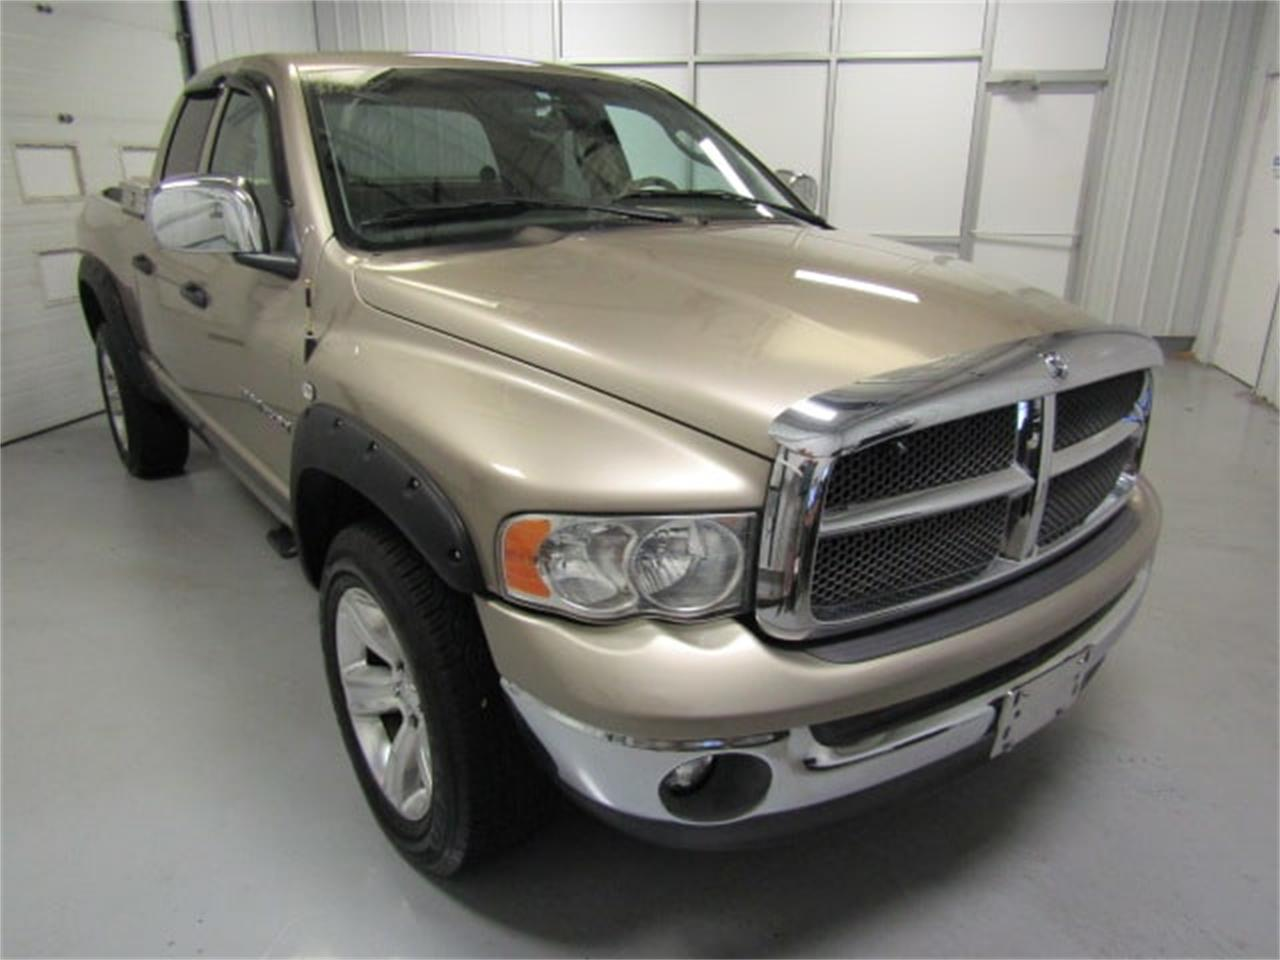 2002 Dodge Ram 1500 For Sale >> 2002 Dodge Ram 1500 For Sale Classiccars Com Cc 1093335